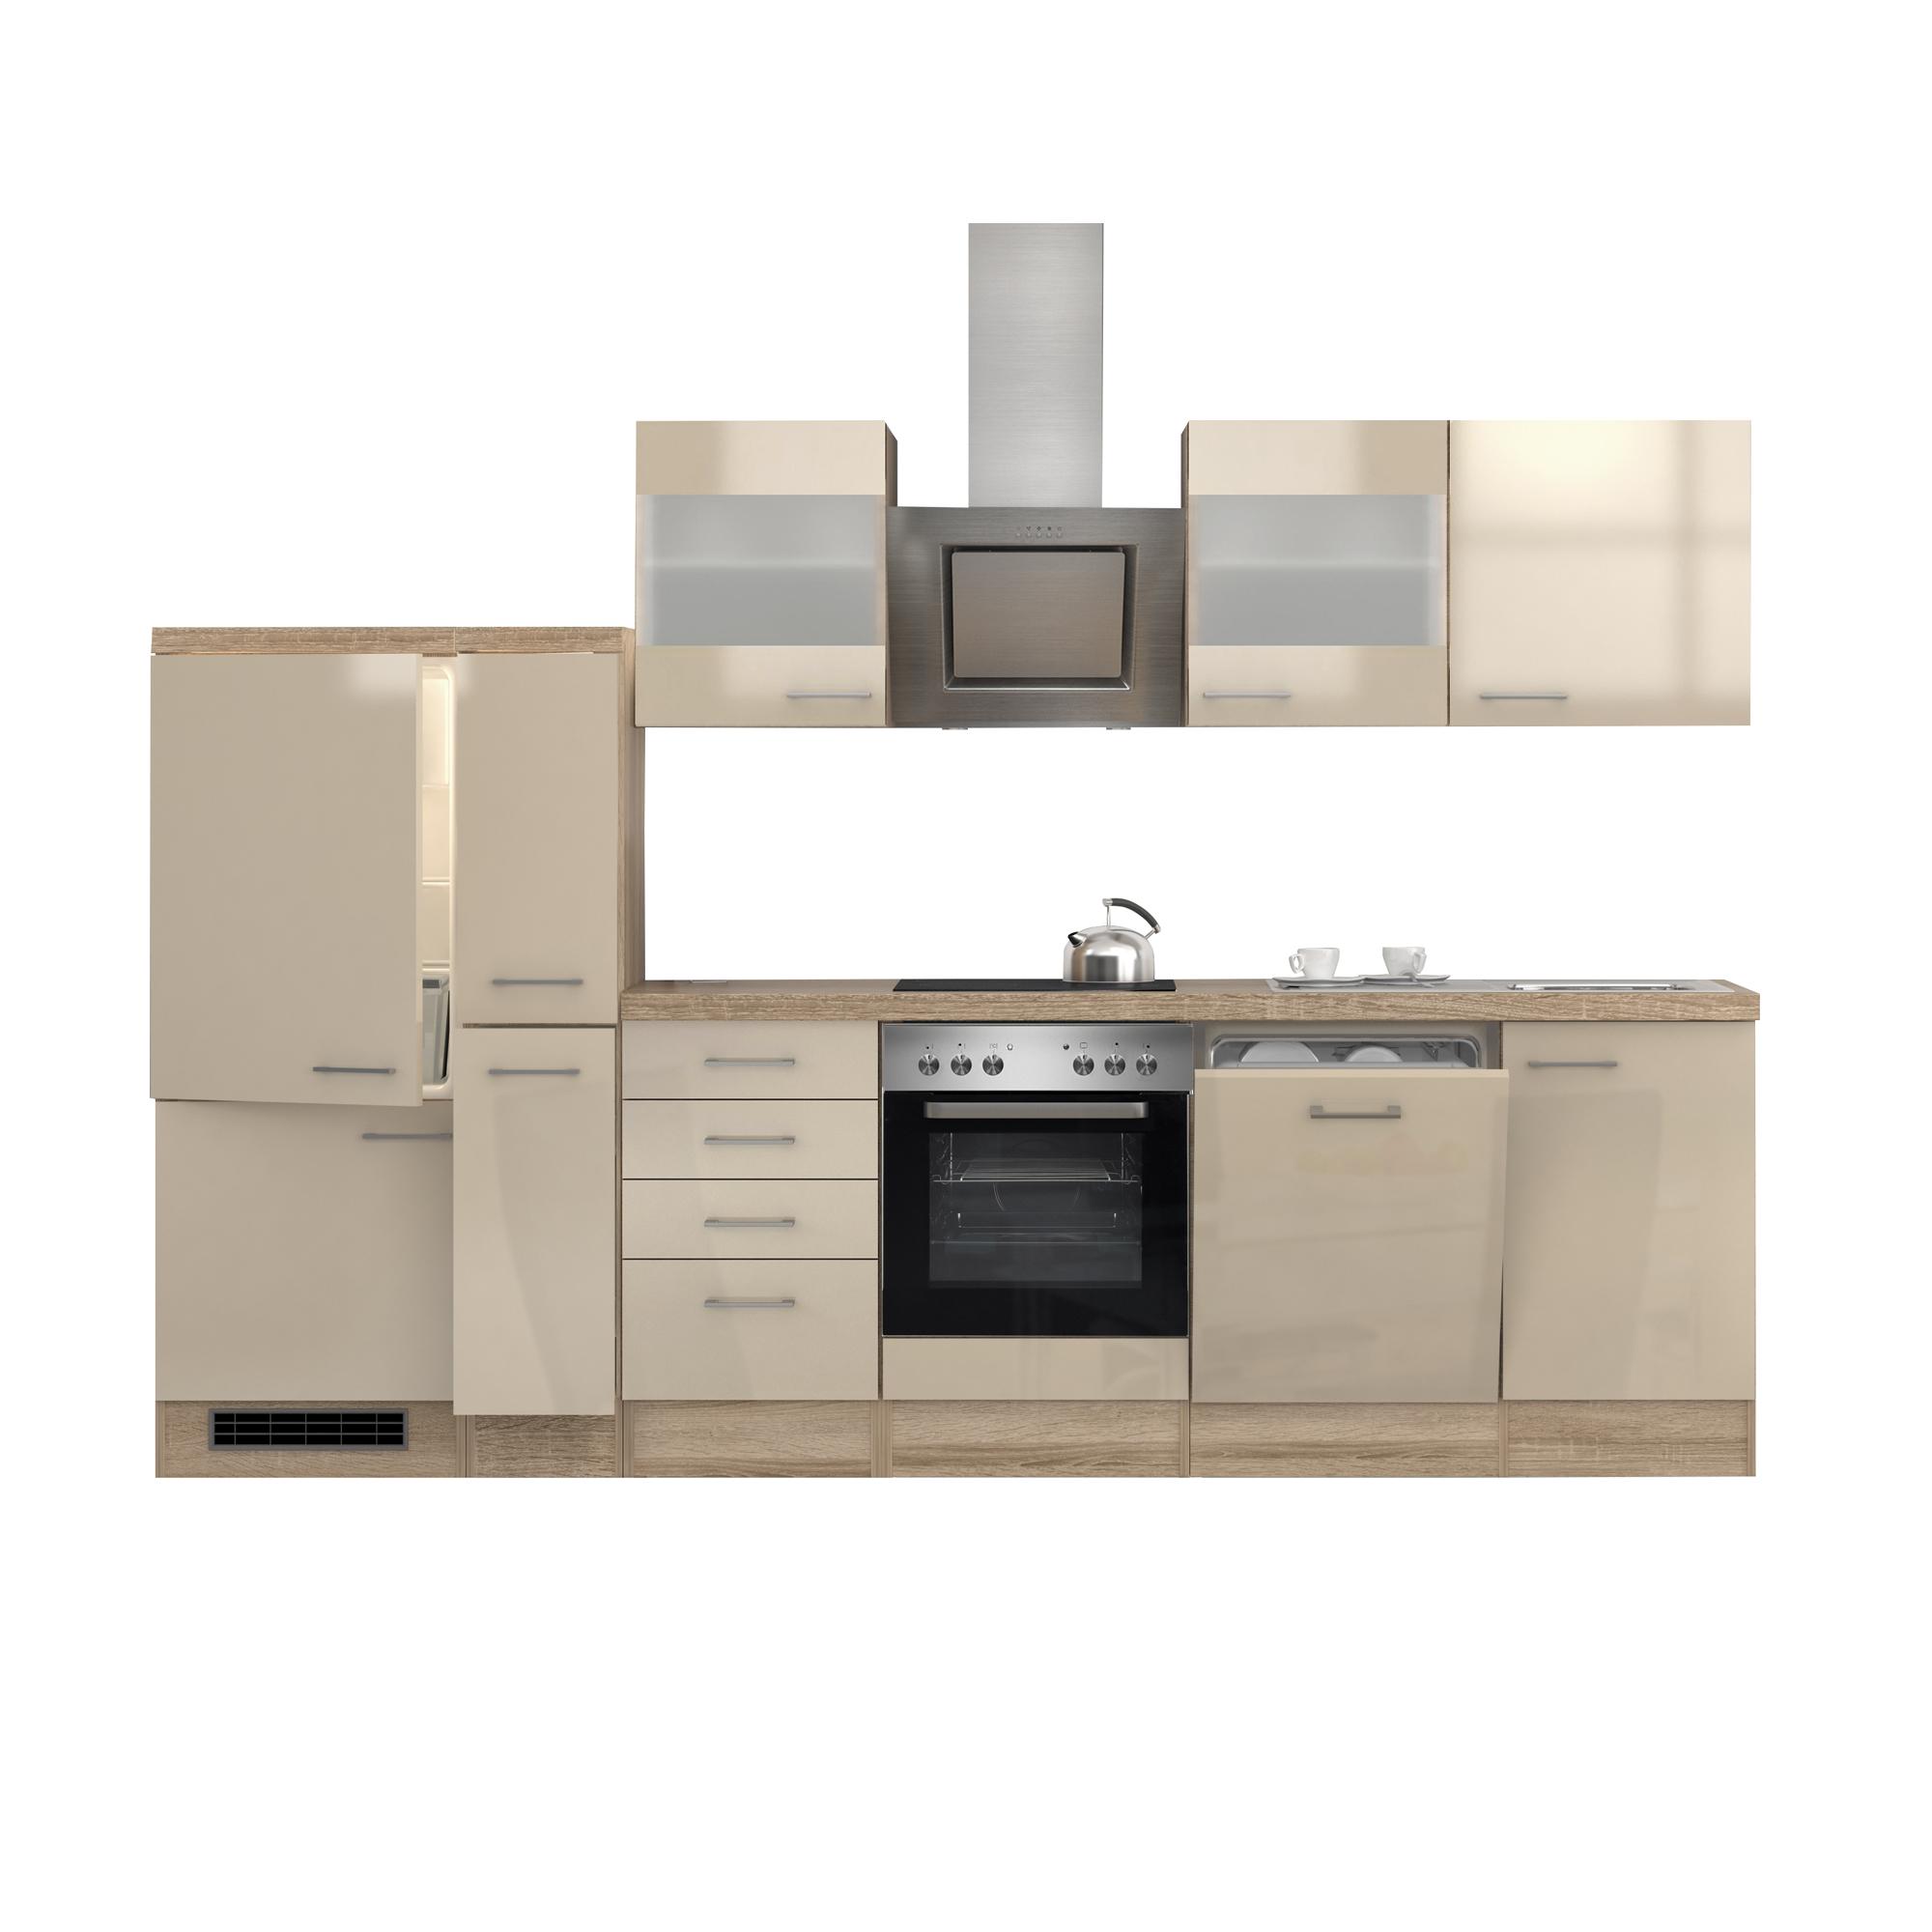 k chenzeile nepal e ger te 2 glash nger 15 teilig breite 310 cm creme k che k chenzeilen. Black Bedroom Furniture Sets. Home Design Ideas